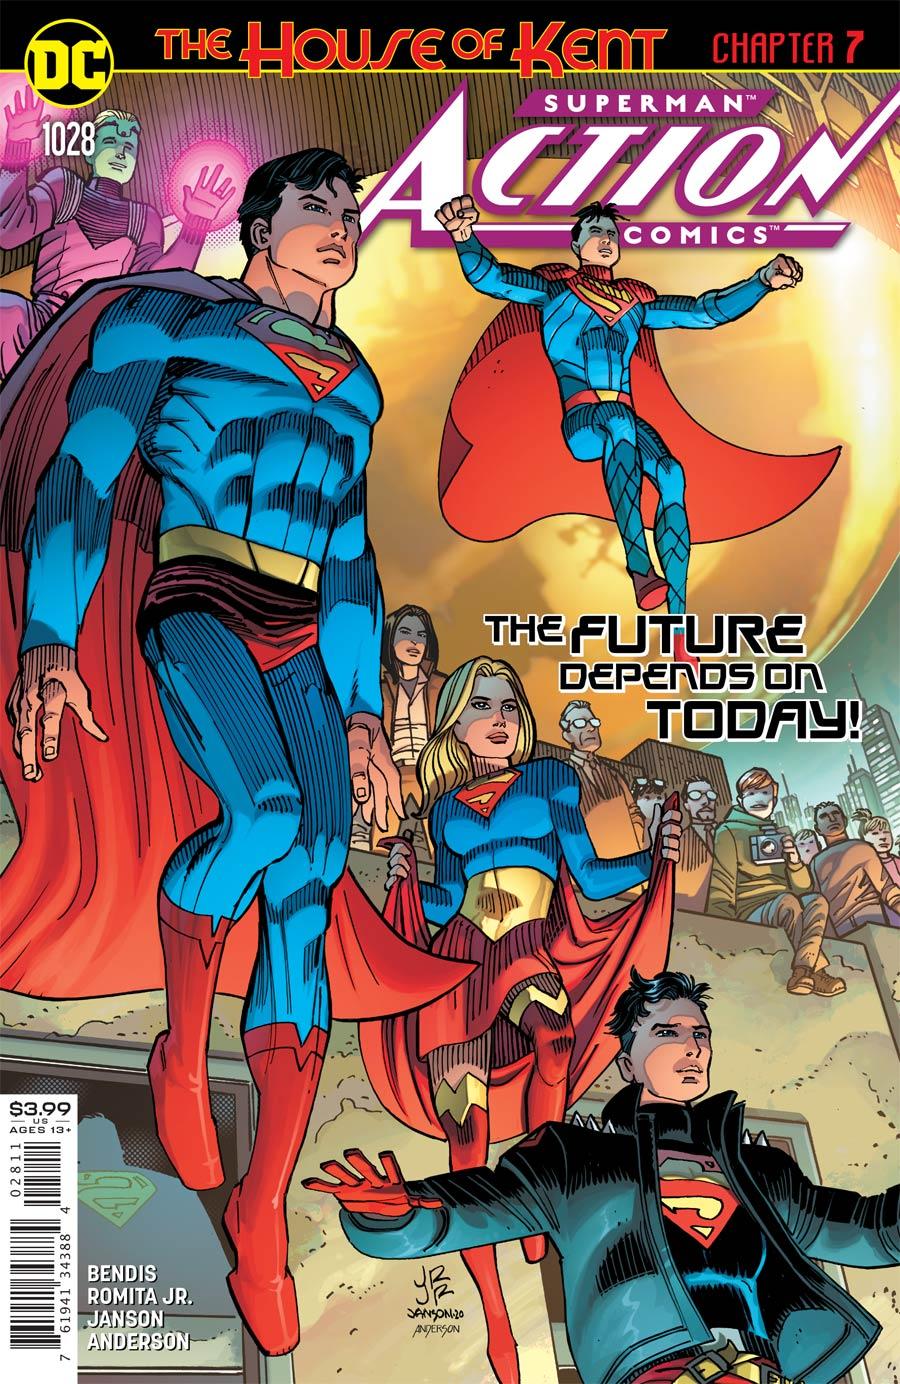 Action Comics Vol 2 #1028 Cover A Regular John Romita Jr & Klaus Janson Cover